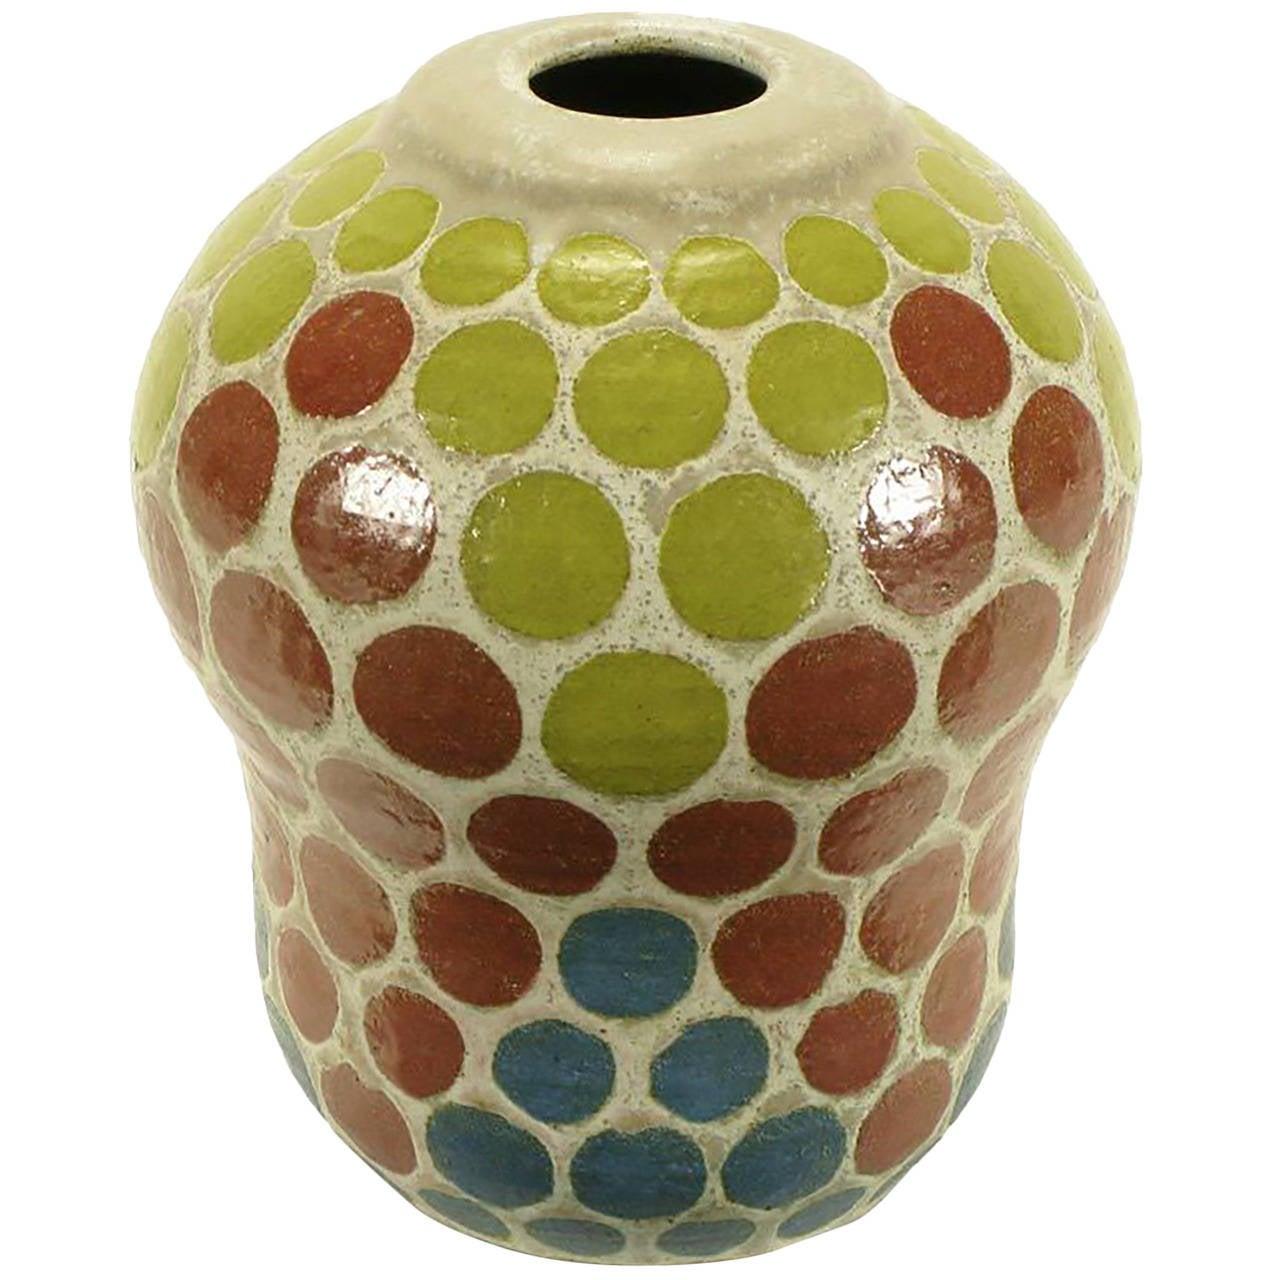 1967 tomiya matsuda red blue and yellow circles studio pottery 1967 tomiya matsuda red blue and yellow circles studio pottery vase for sale reviewsmspy